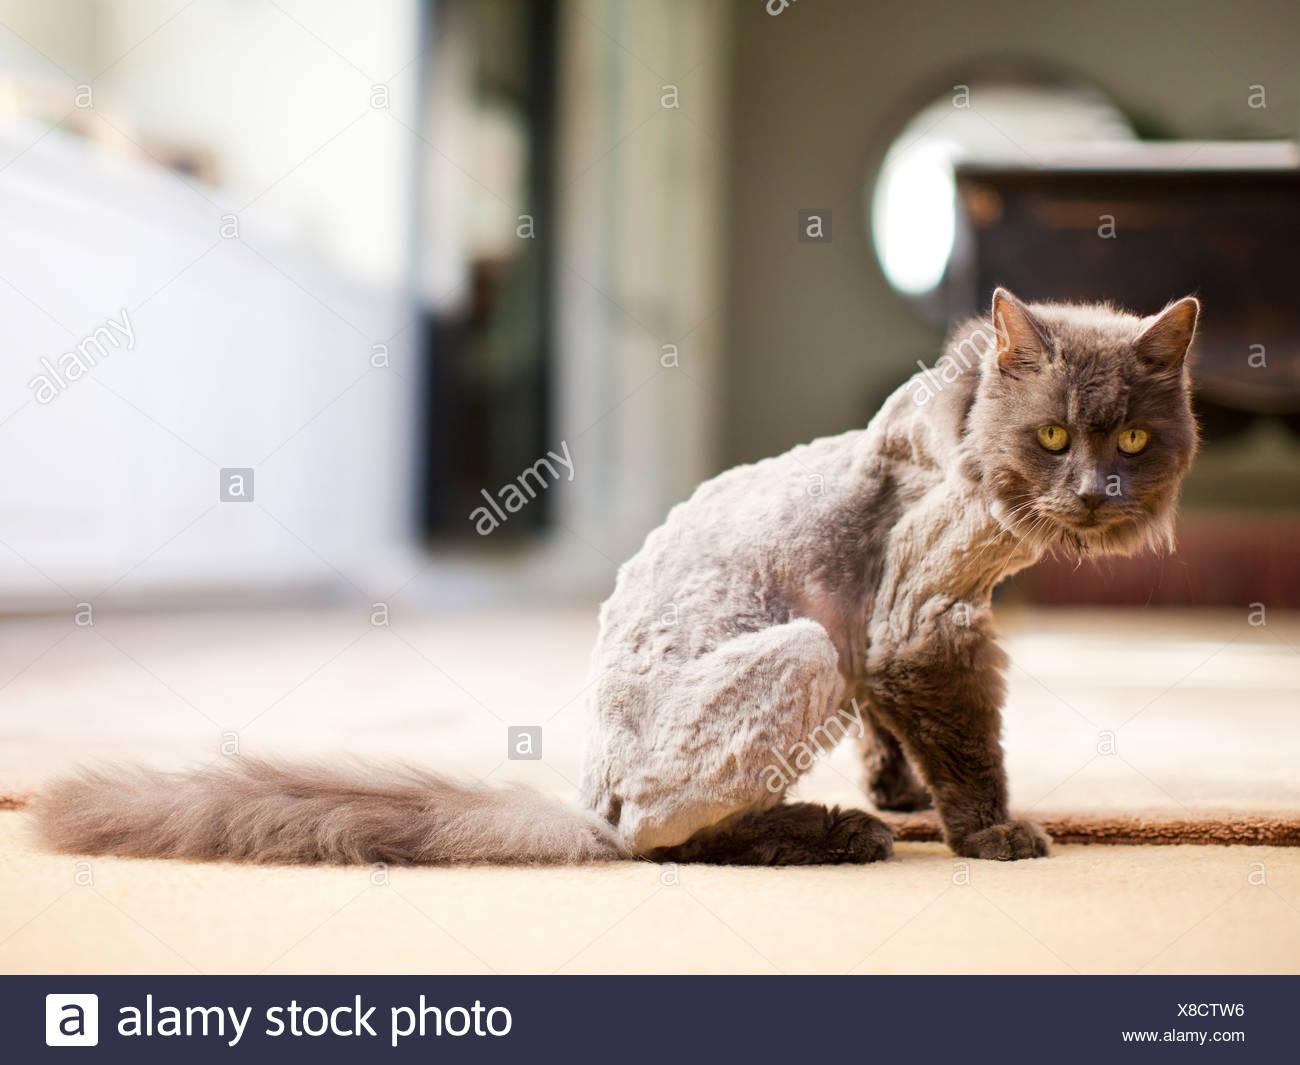 Estados Unidos, Utah, Salt Lake, parcialmente afeitadas cat mirando a la cámara Foto de stock